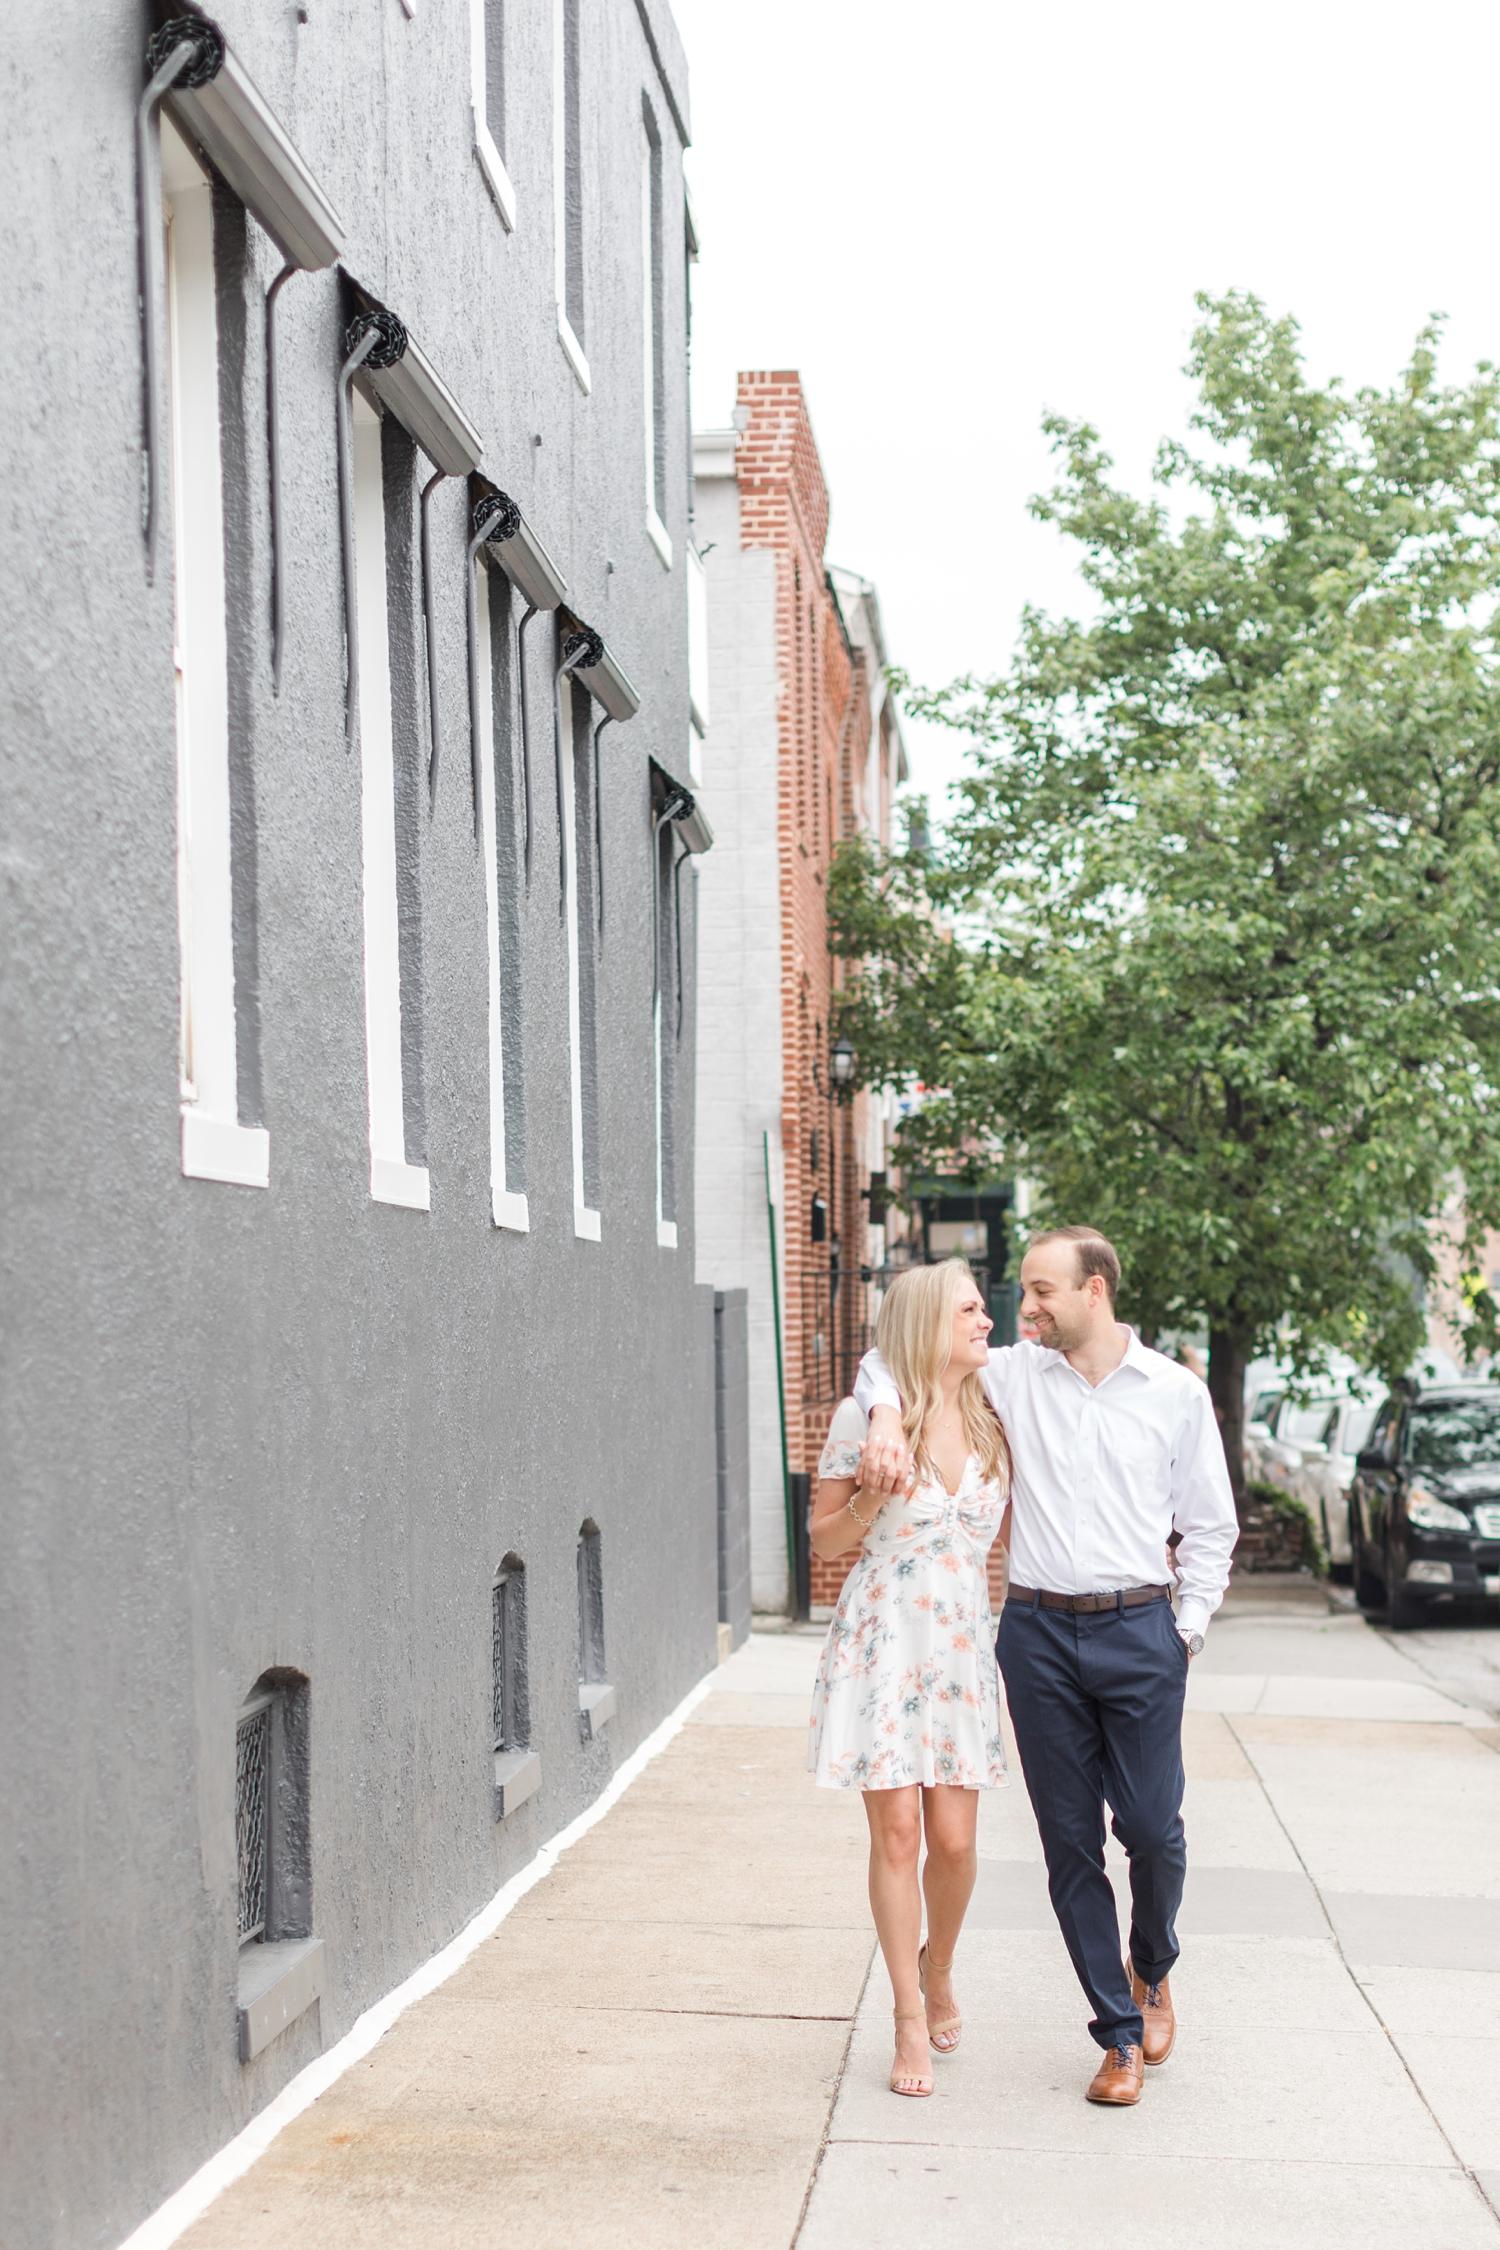 Maddy and Lloyd Engagement-140_Baltimore-Maryland-engagement-photography-Sherwood-Gardens-Maryland-engagement-photographer-anna-grace-photography-photo.jpg